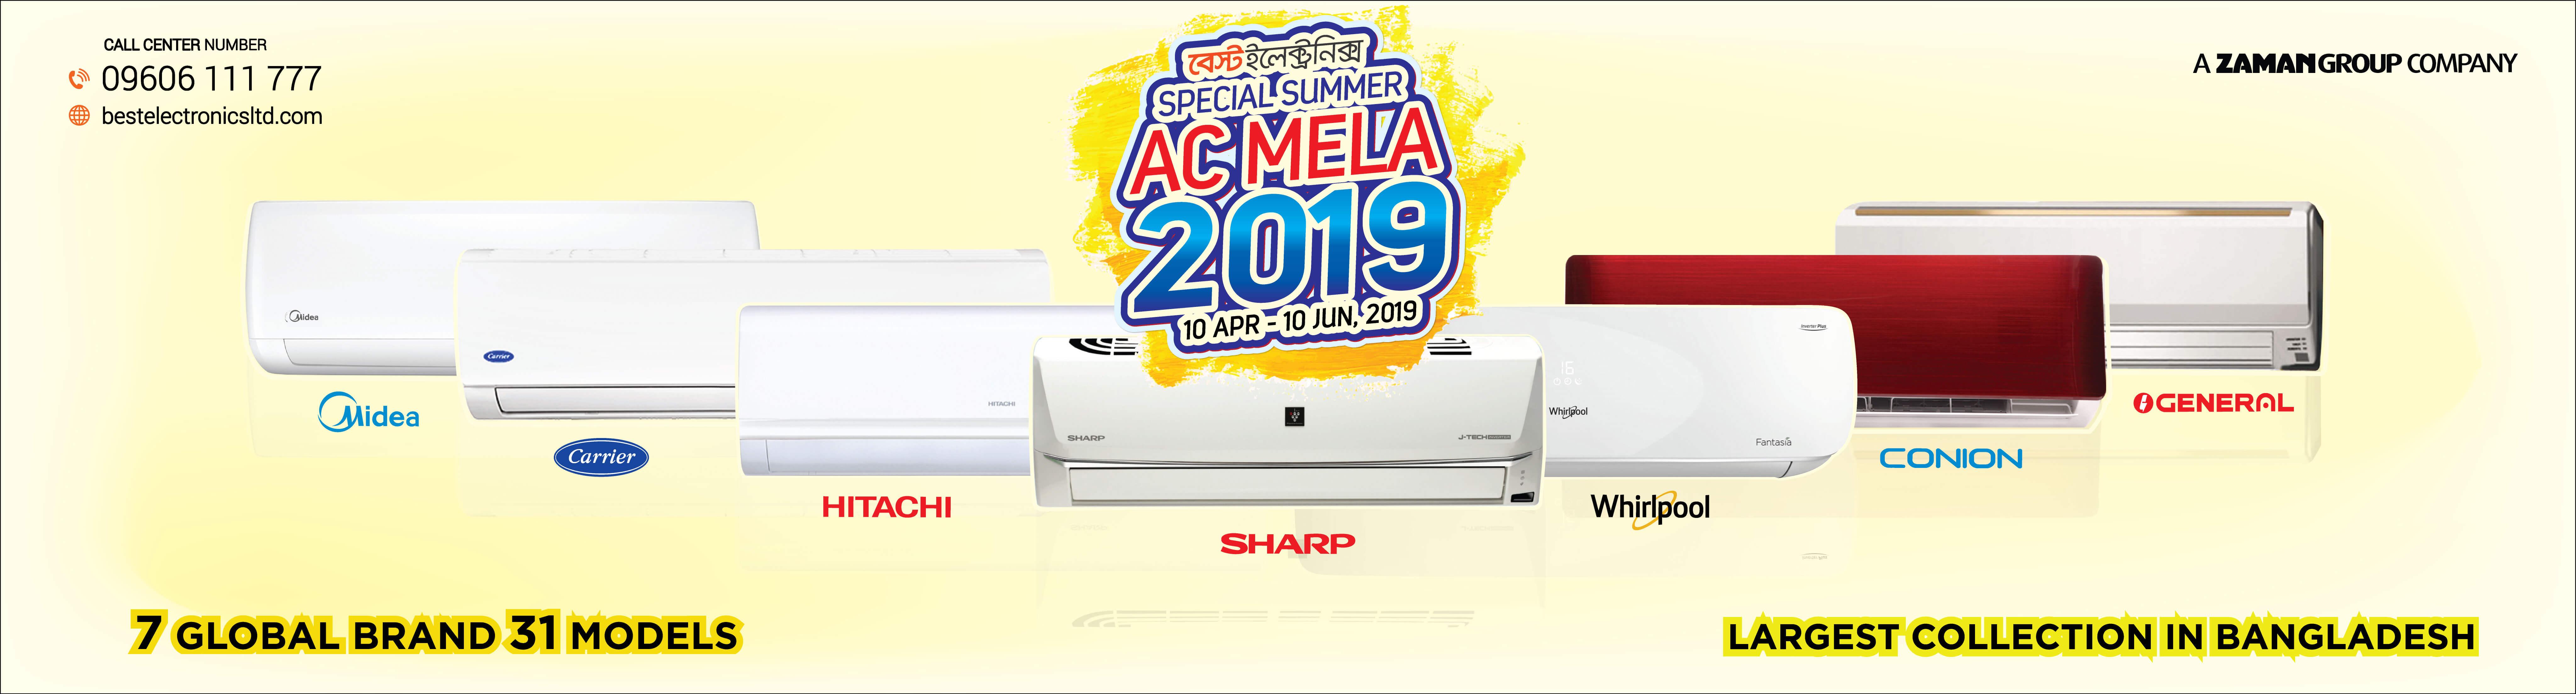 Best Electronics Summer Special AC Mela 2019